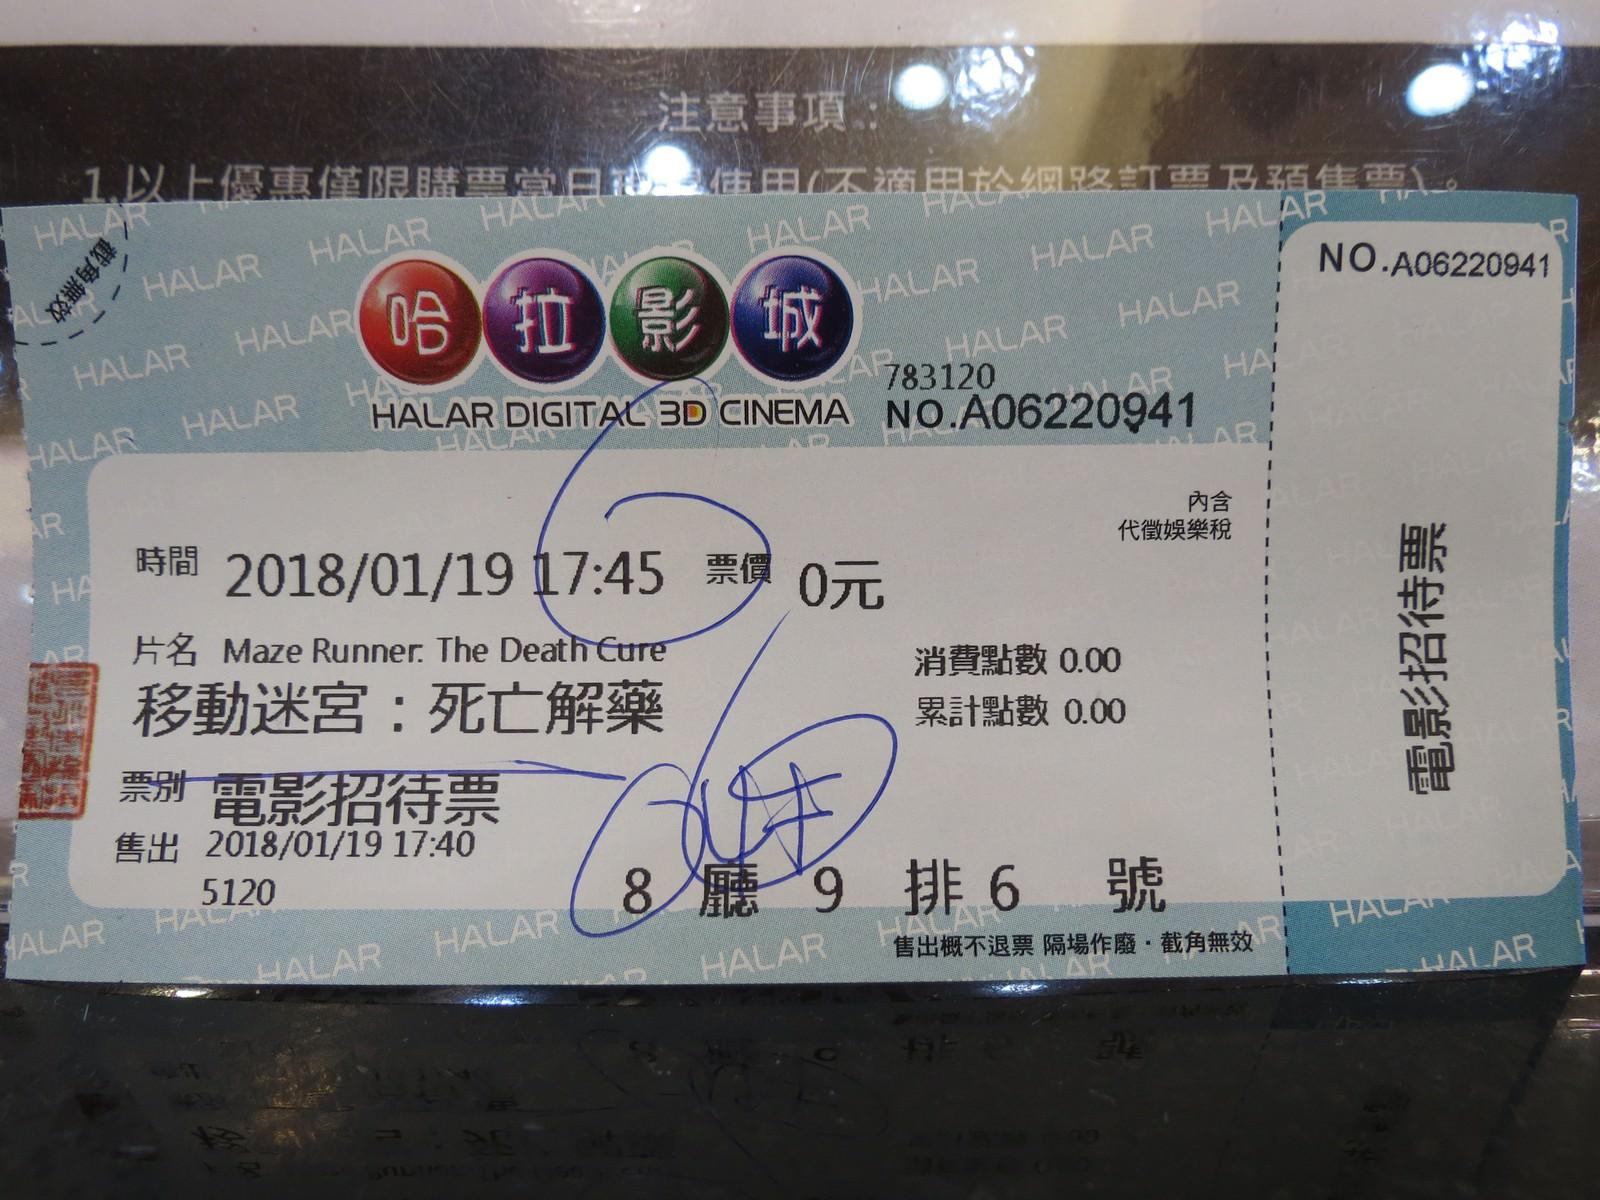 Movie, Maze Runner: The Death Cure(美國, 2018) / 移動迷宮:死亡解藥(台灣.香港) / 移动迷宫3:死亡解药(中國), 電影票